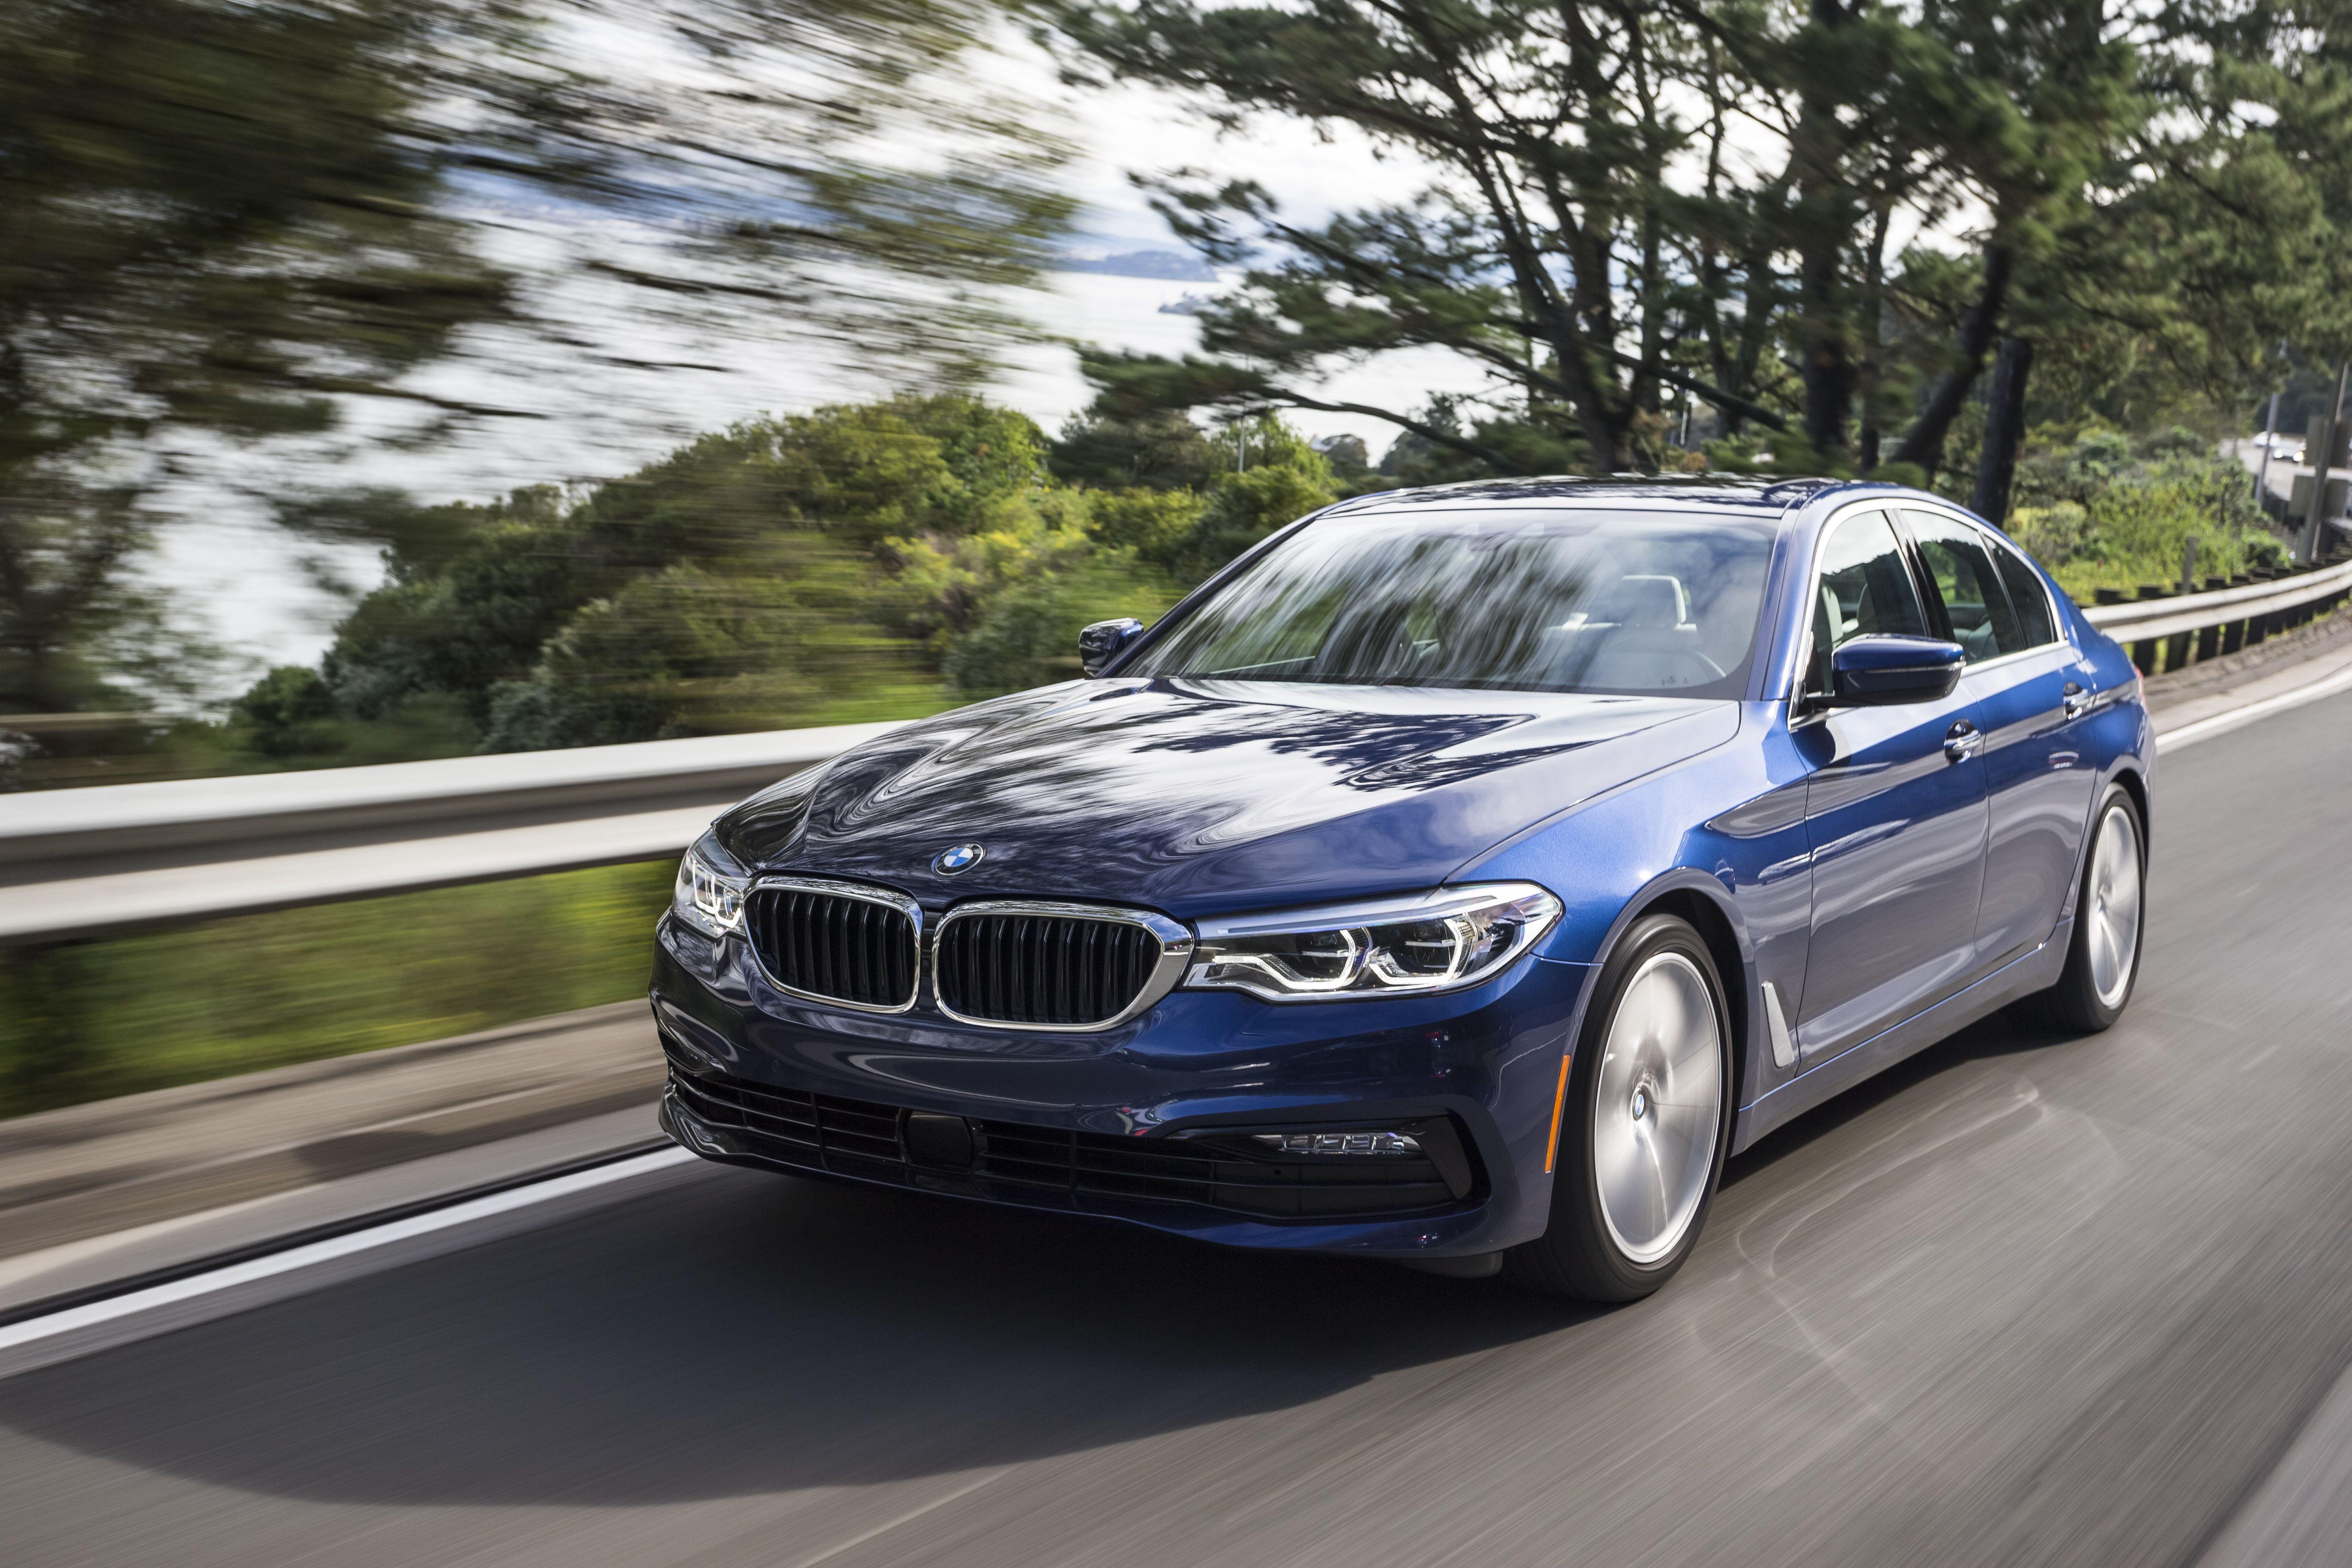 2017 BMW 530i WOW! Do I Miss My Ex! Focus Daily News